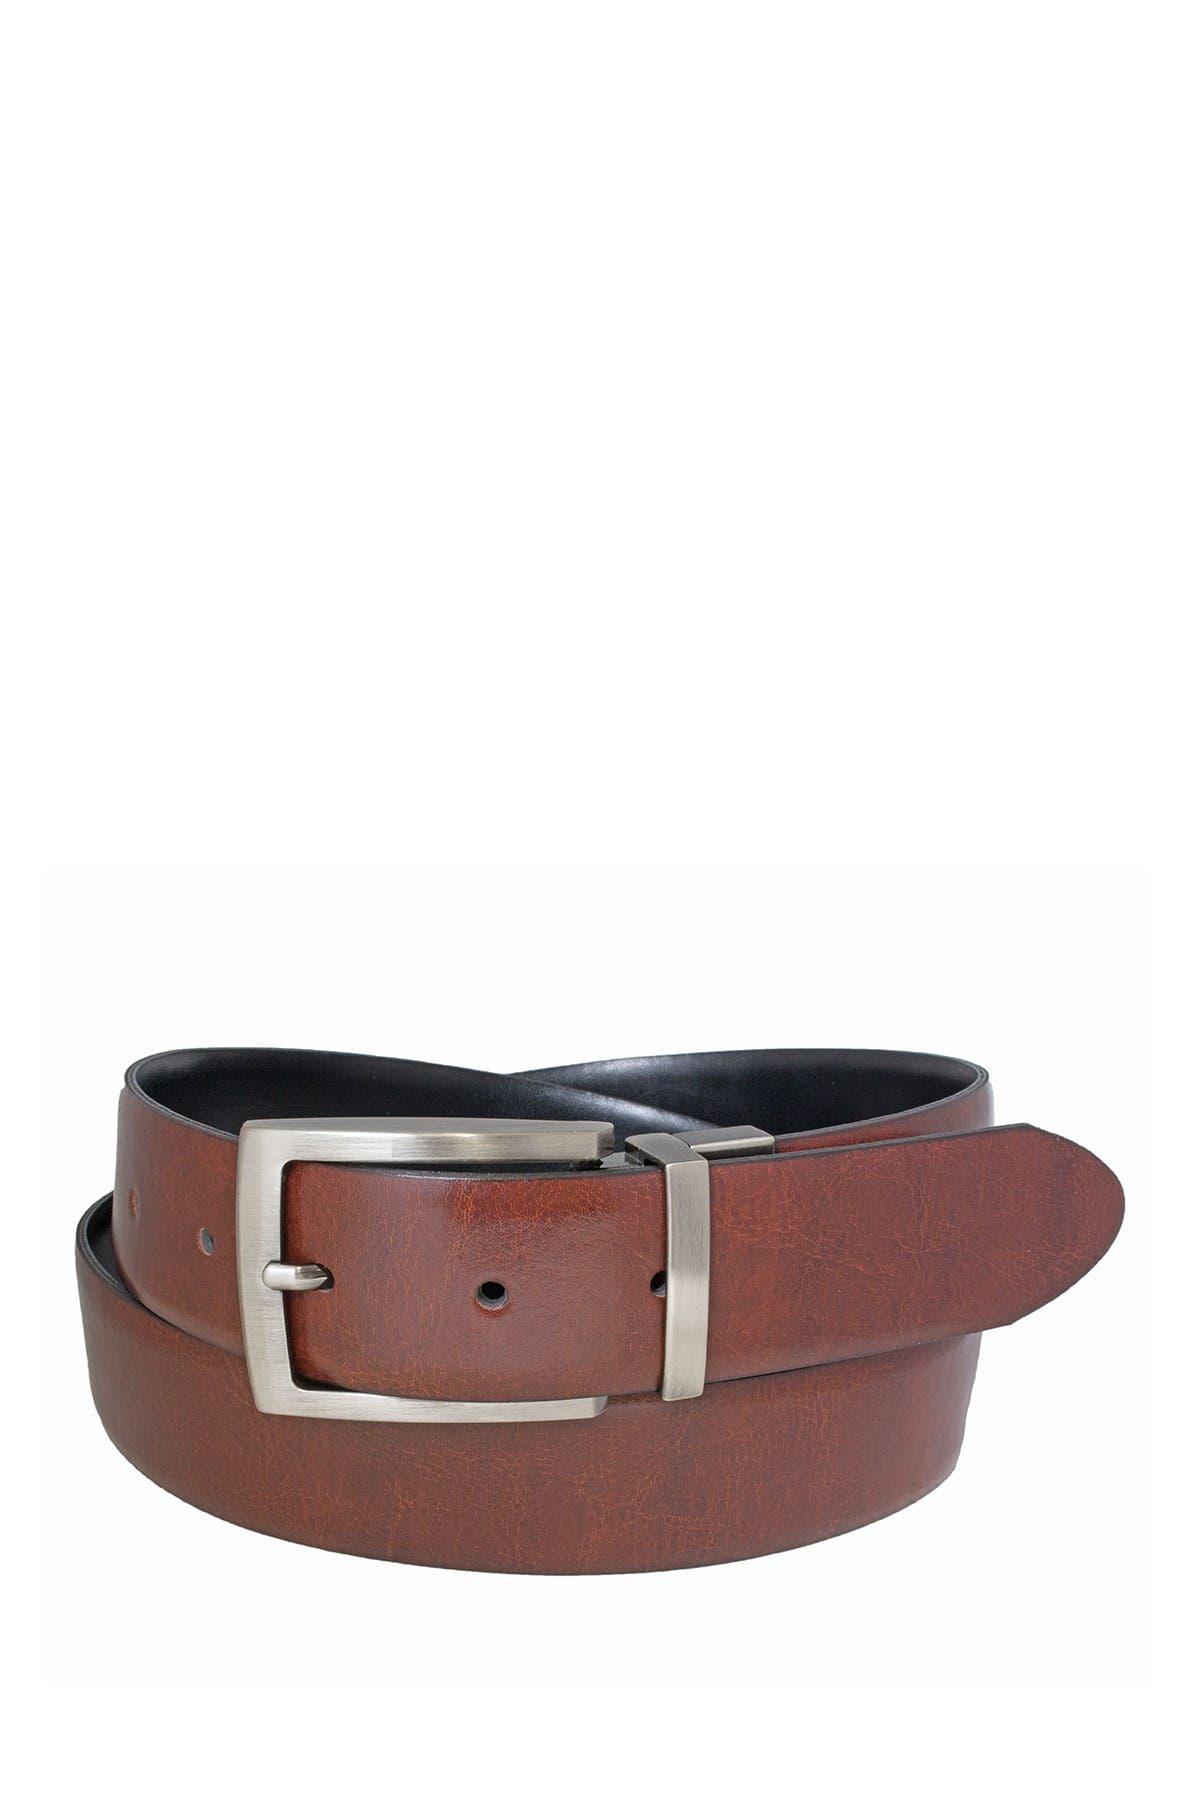 Image of BOSCA Reversible 35mm Rolled Edge Leather Belt